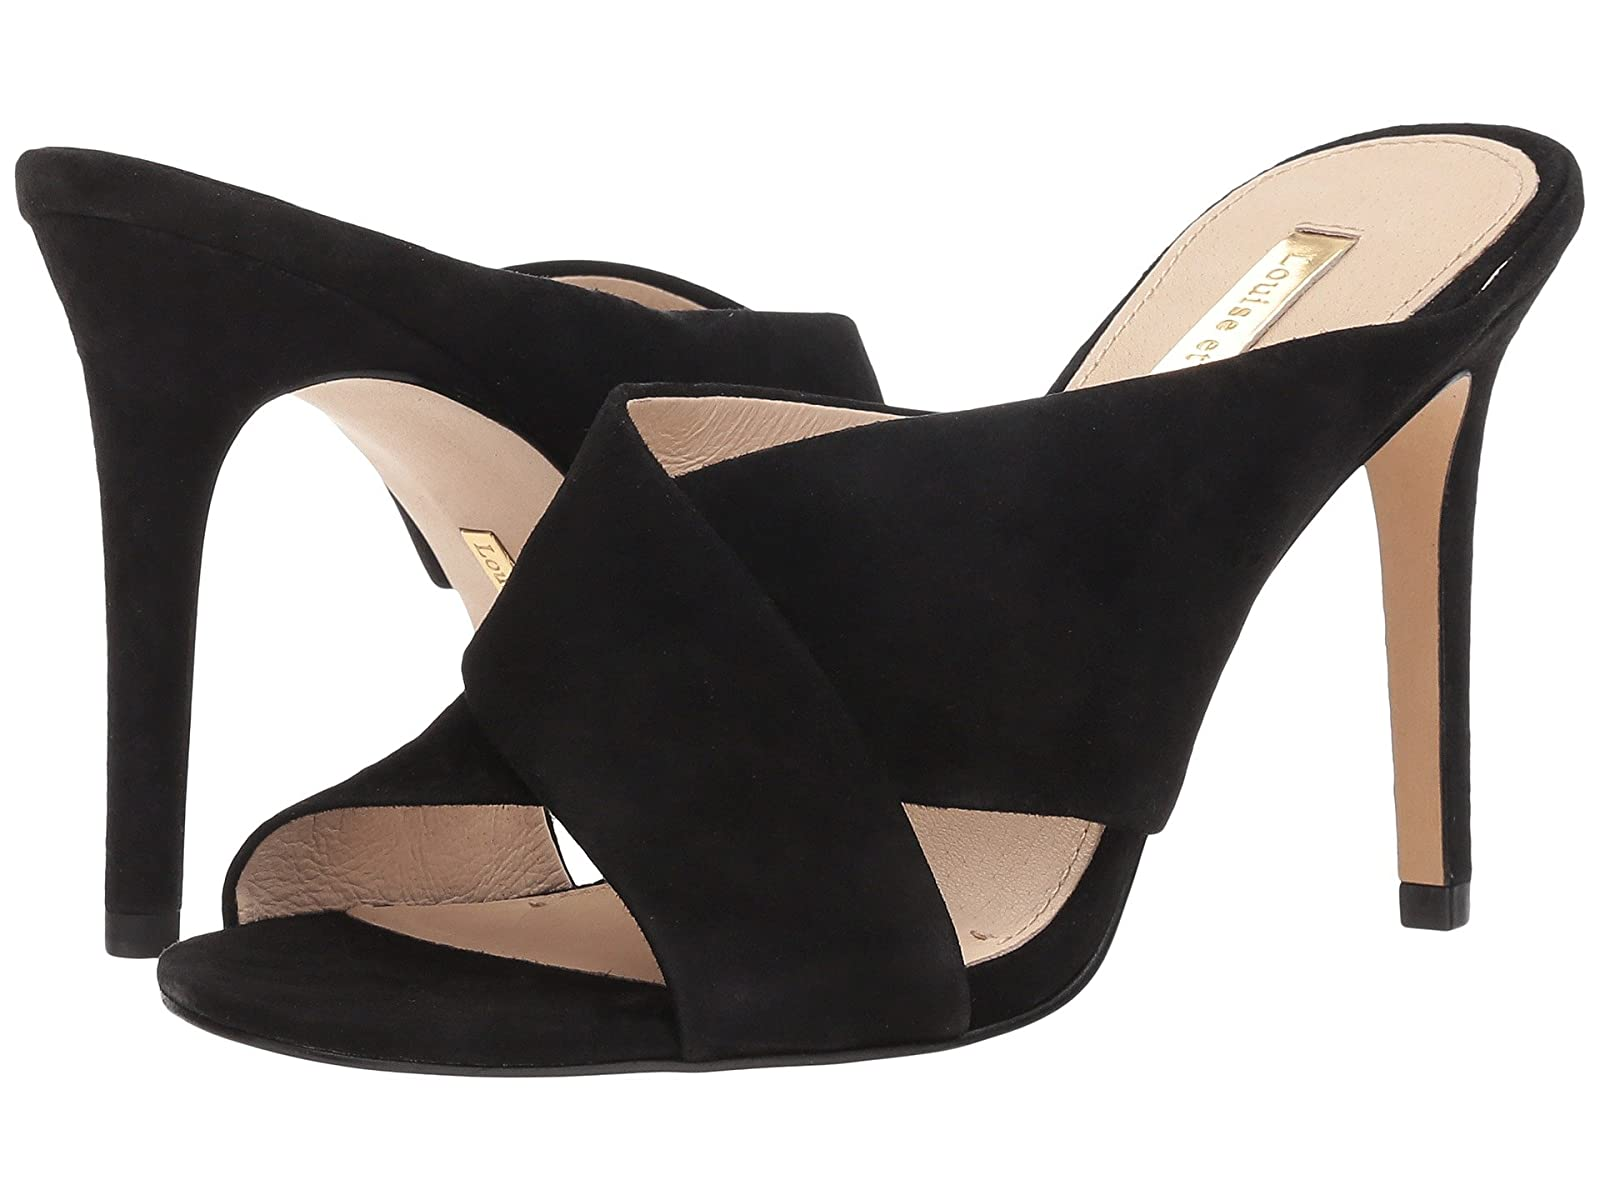 Louise et Cie Halloway 2Atmospheric grades have affordable shoes